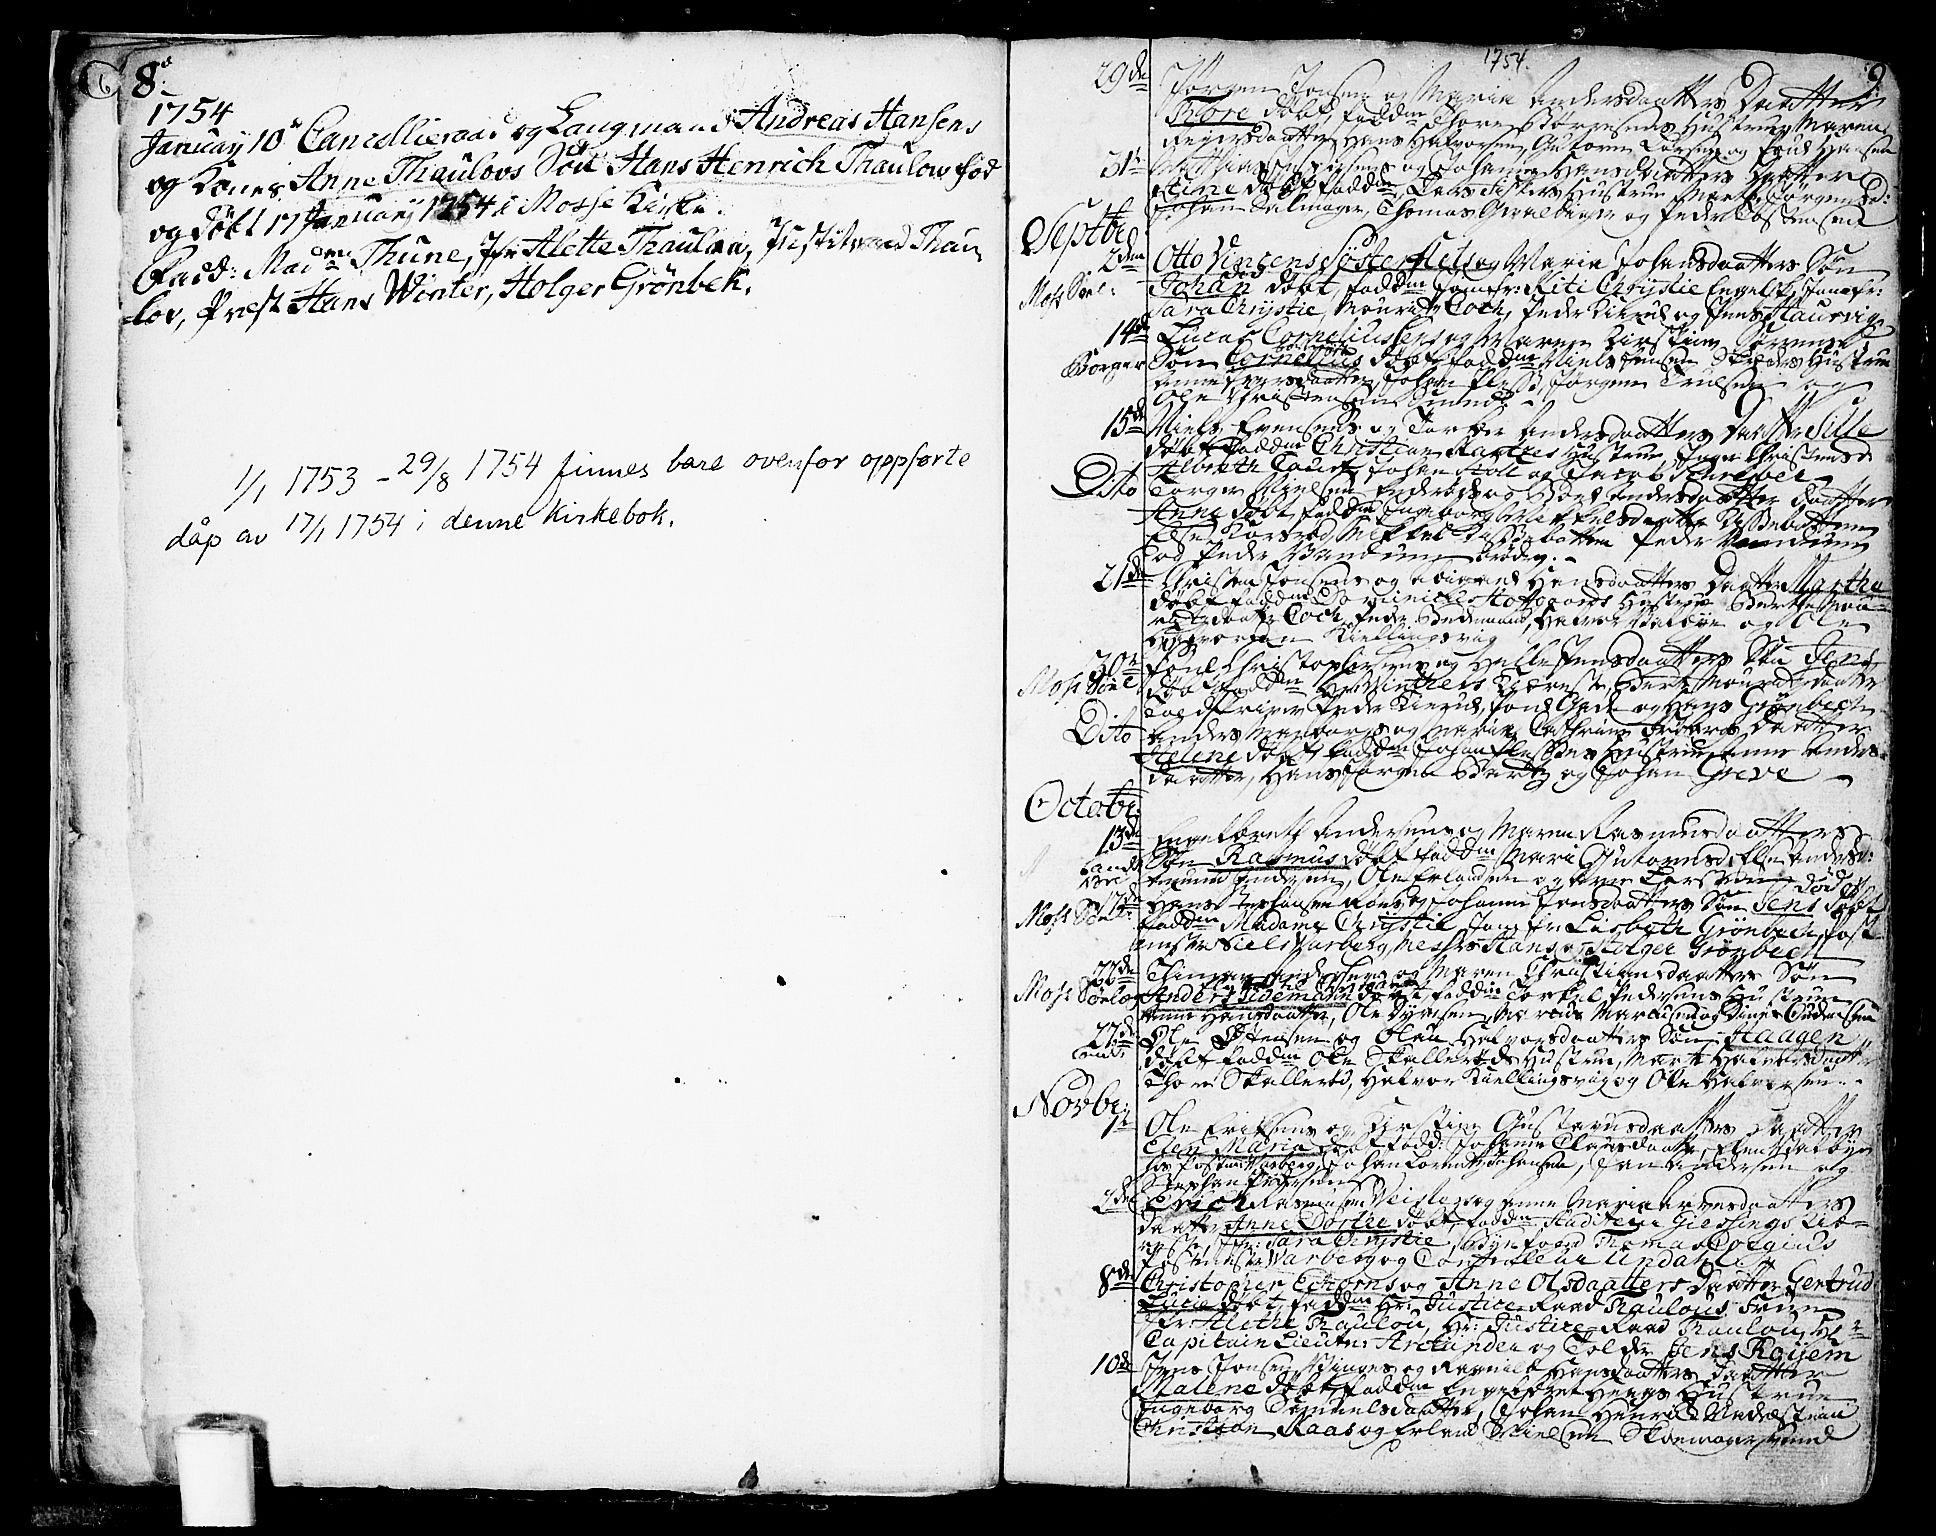 SAO, Moss prestekontor Kirkebøker, F/Fa/Faa/L0002: Ministerialbok nr. I 2, 1753-1779, s. 8-9